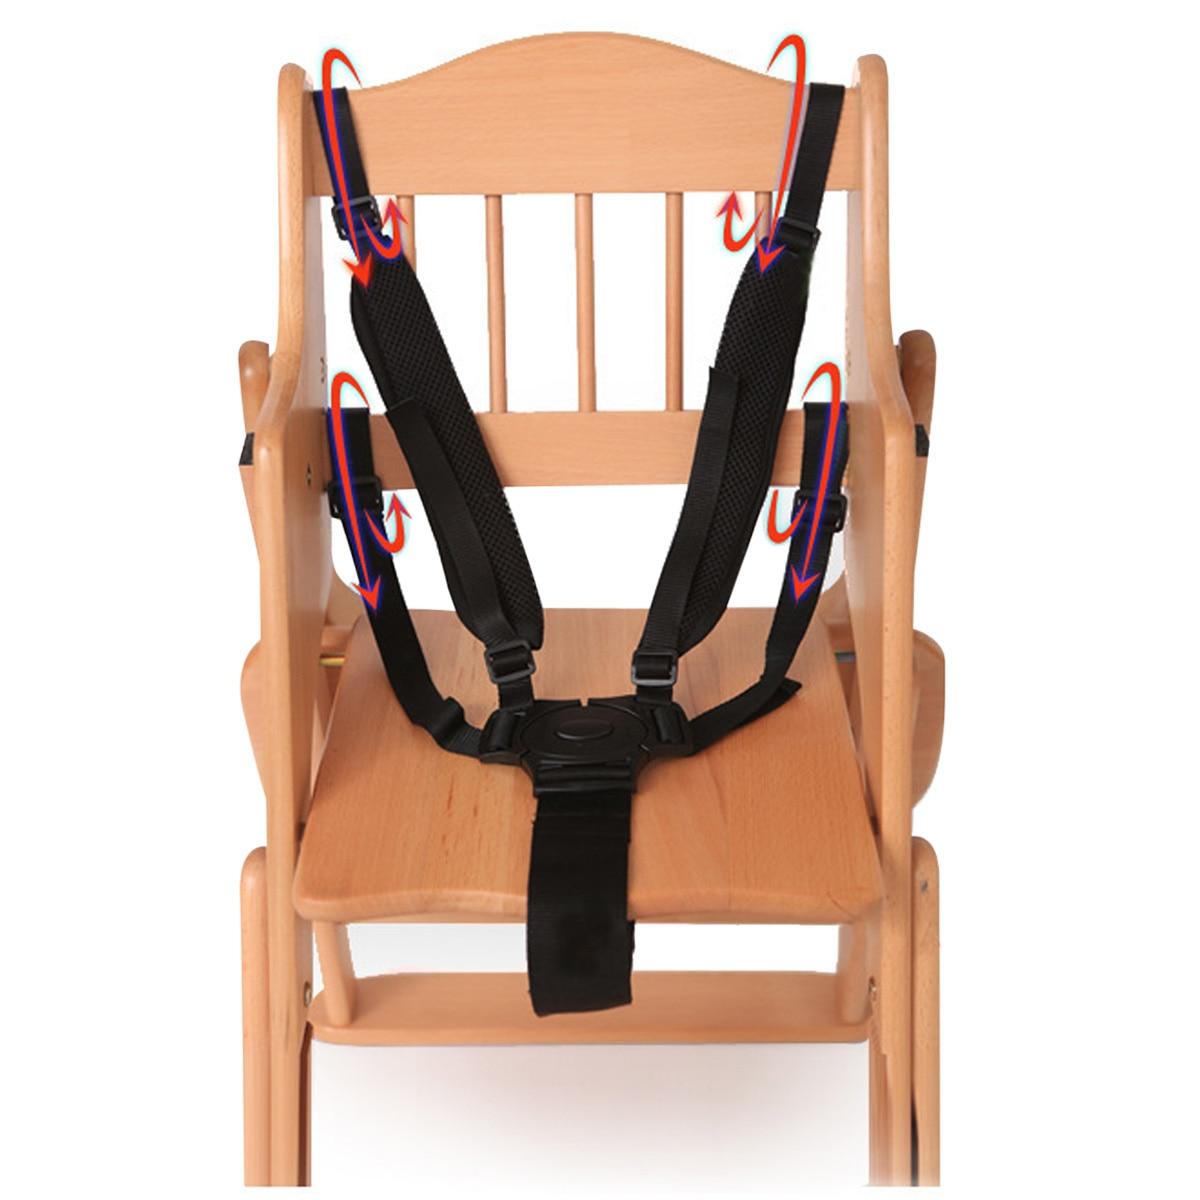 Universal Baby 5 Point Harness Safe Belt Seat Belts For Stroller High Chair Pram Buggy Children